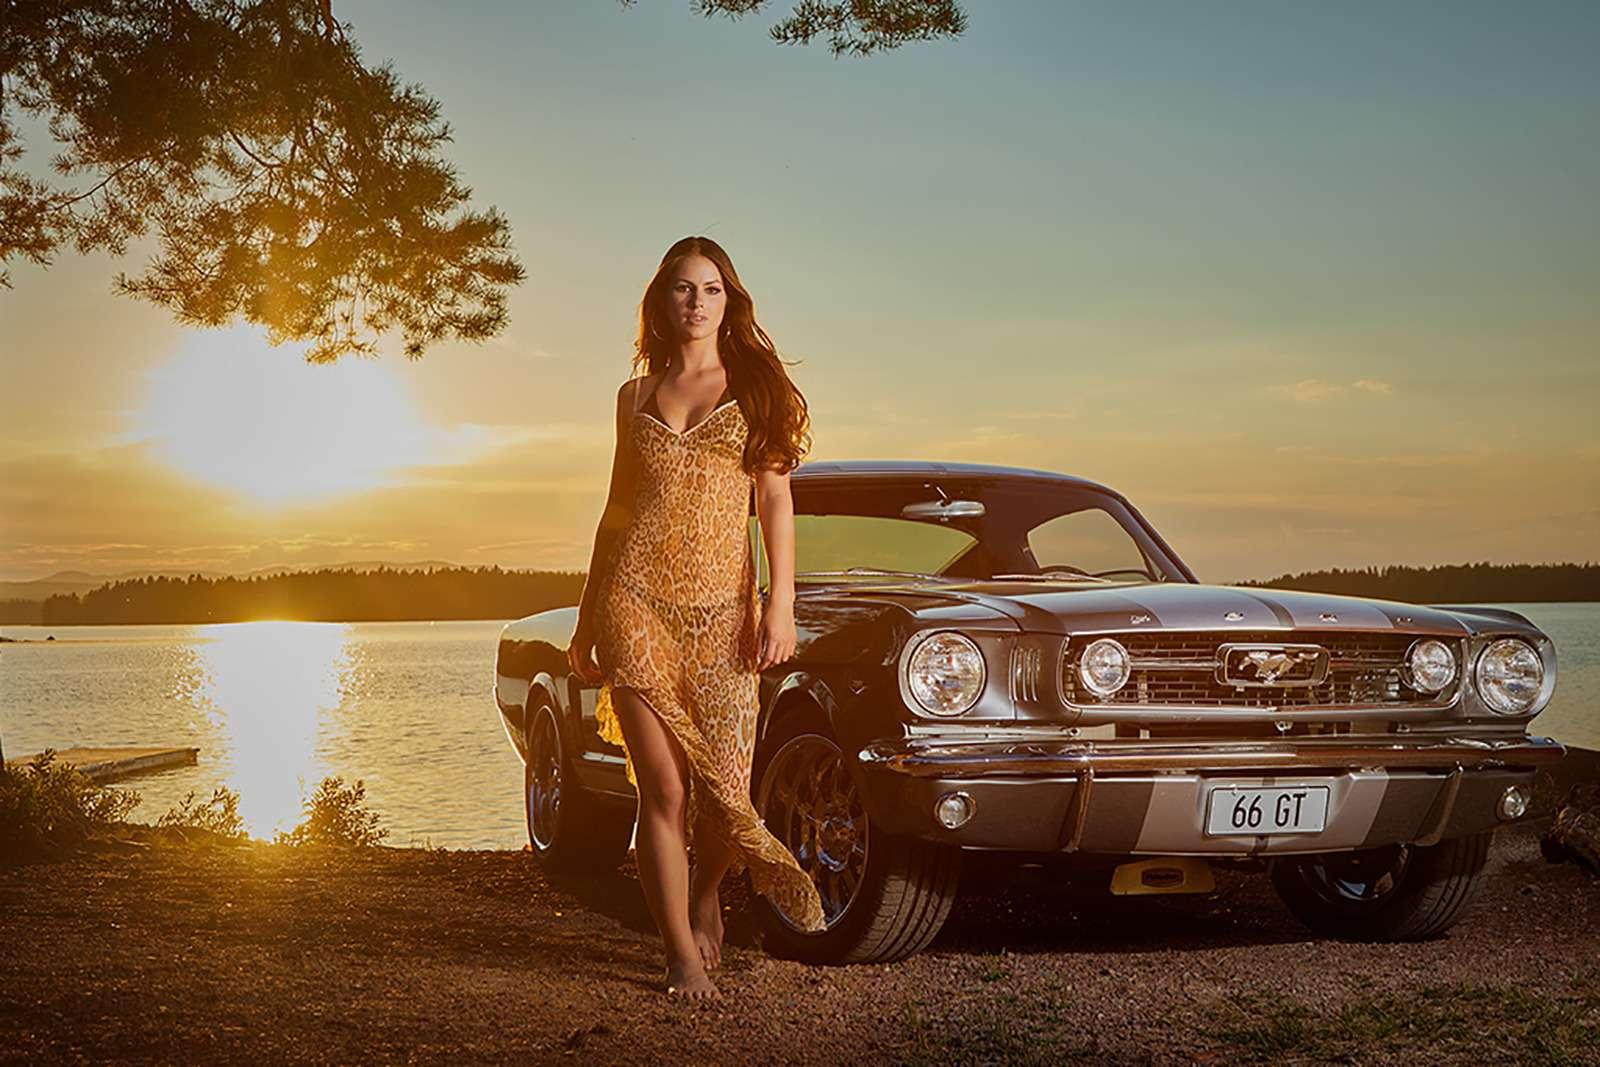 Календарь Miss Tuning 2019: масл-кары иодна красотка— фото 912618